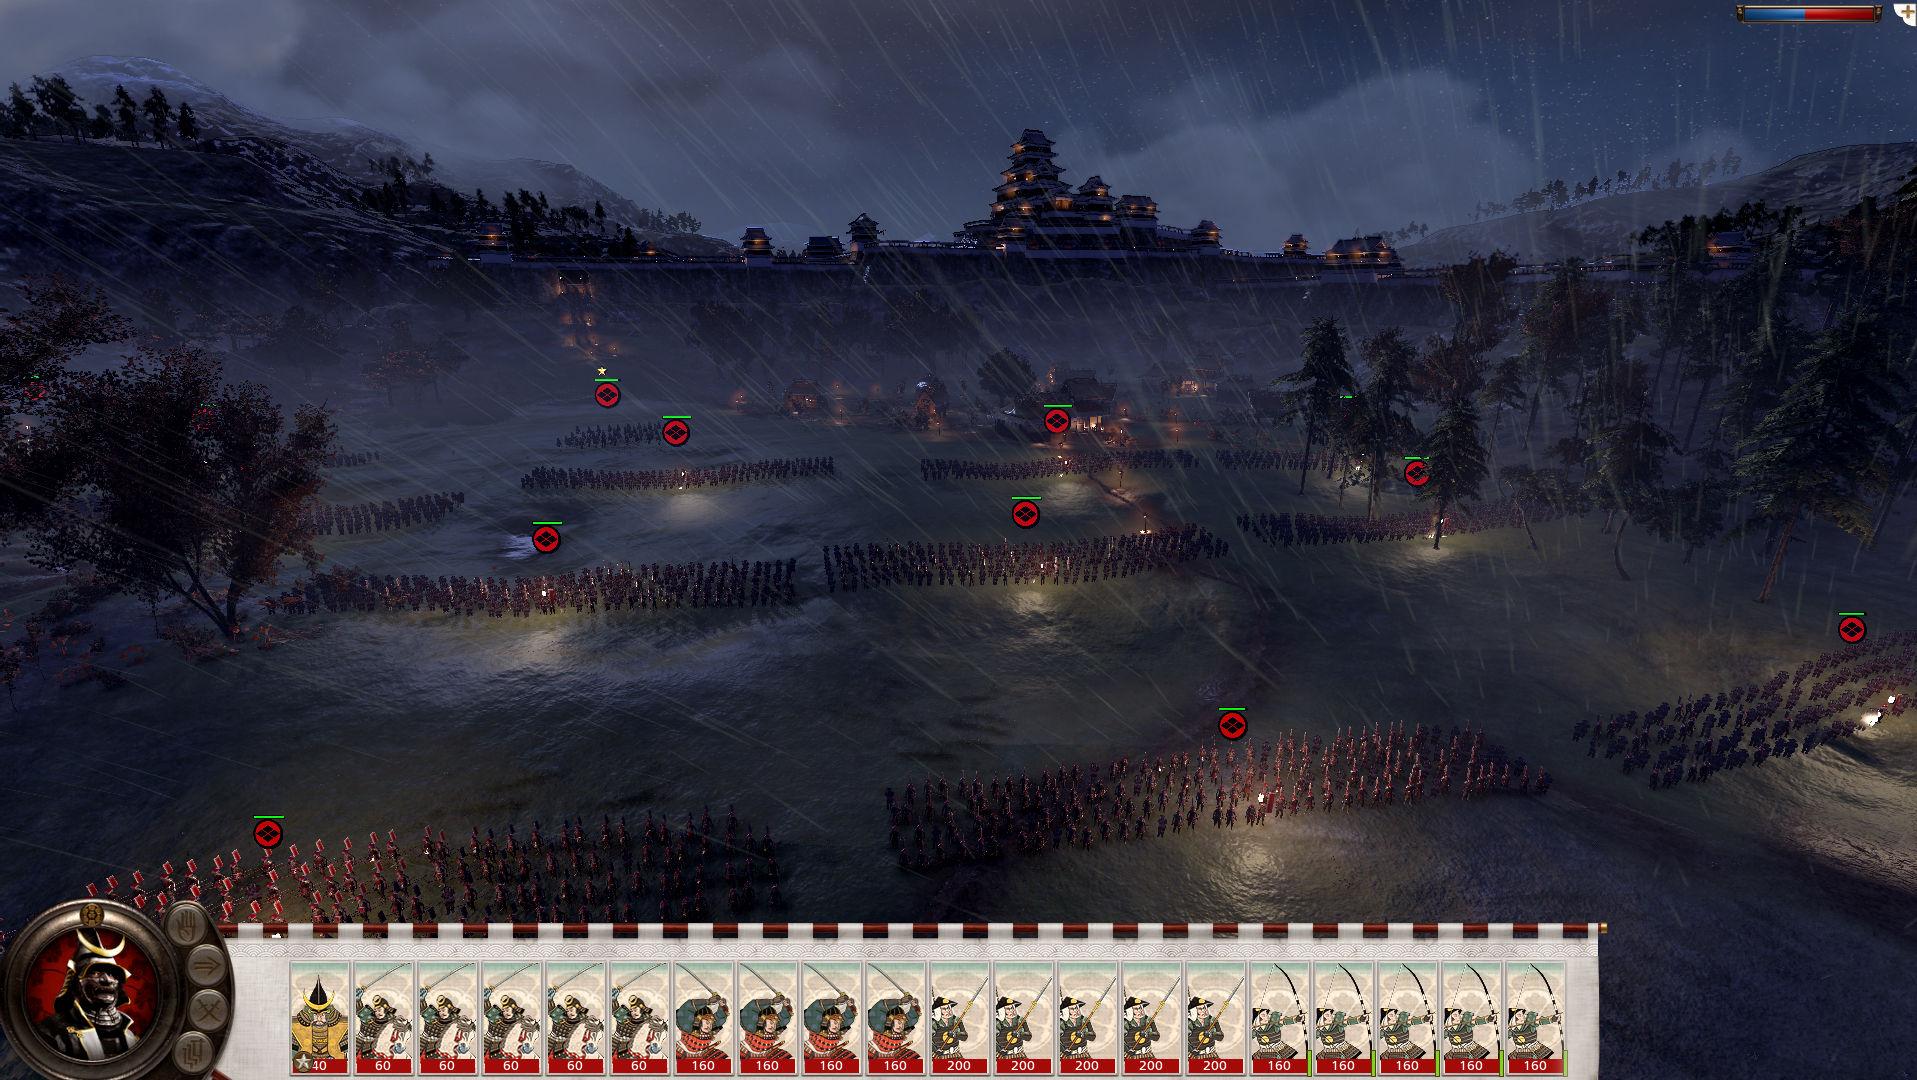 shogun 2 total war torrent download free